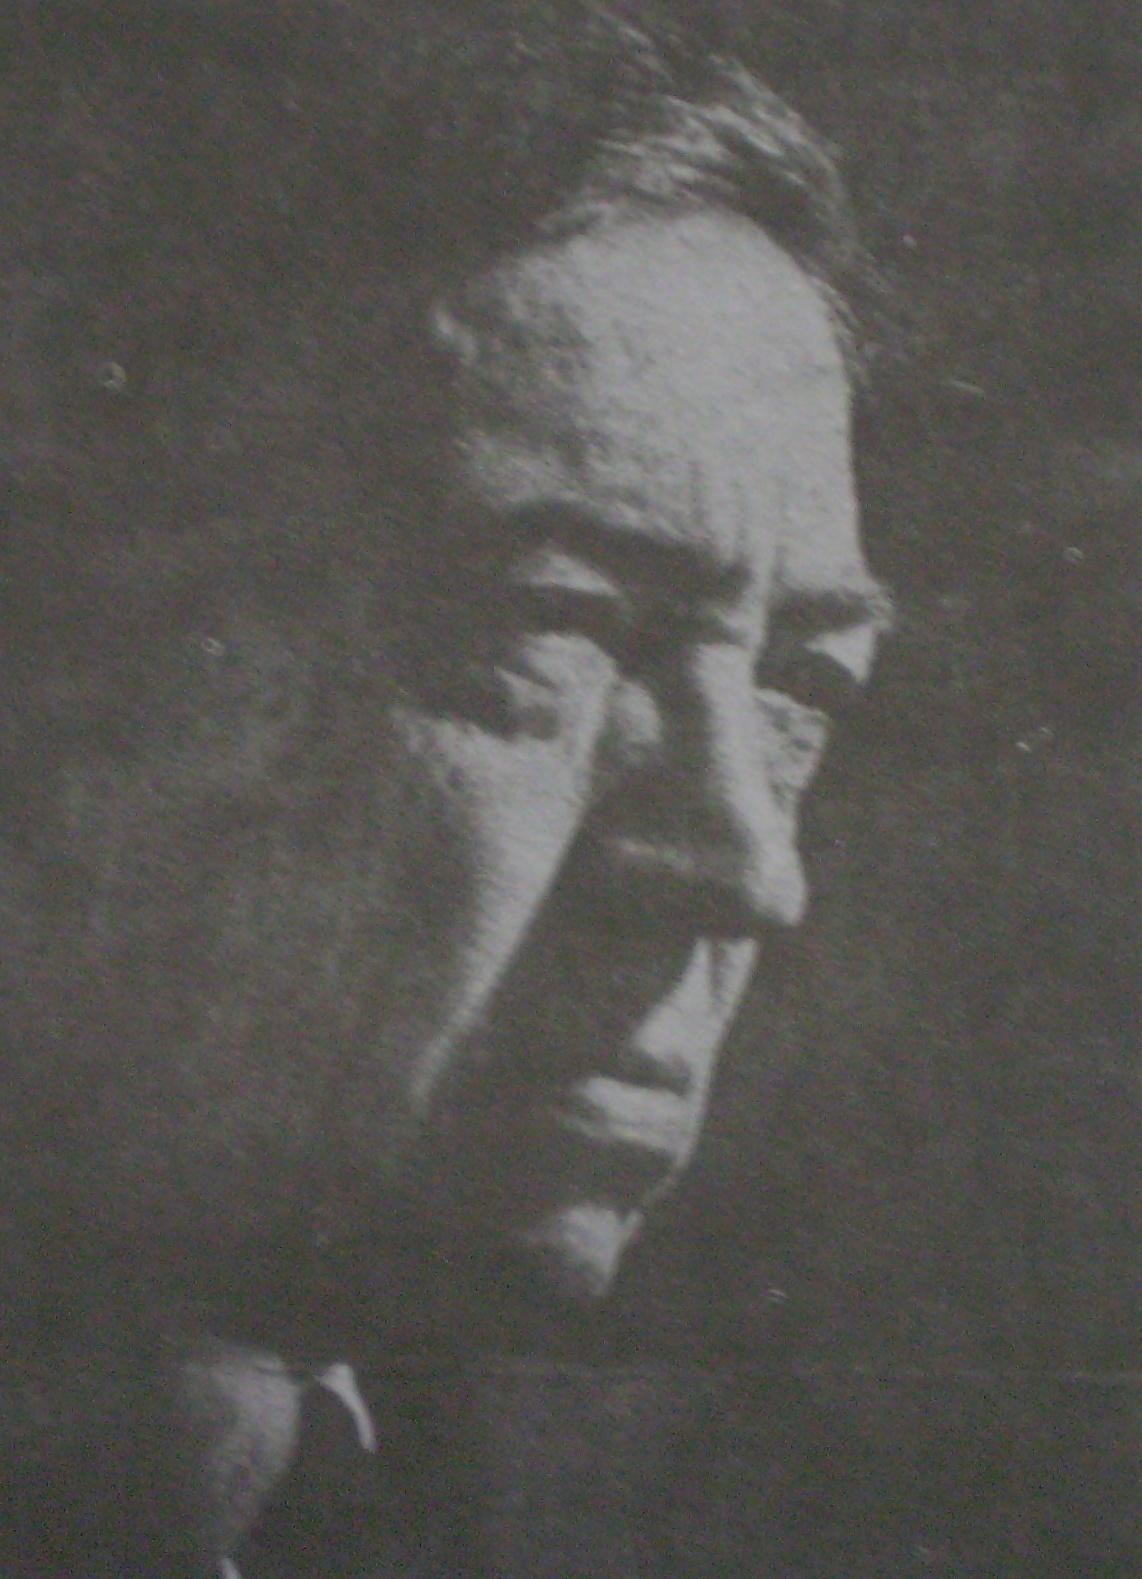 Depiction of Arturo Marasso